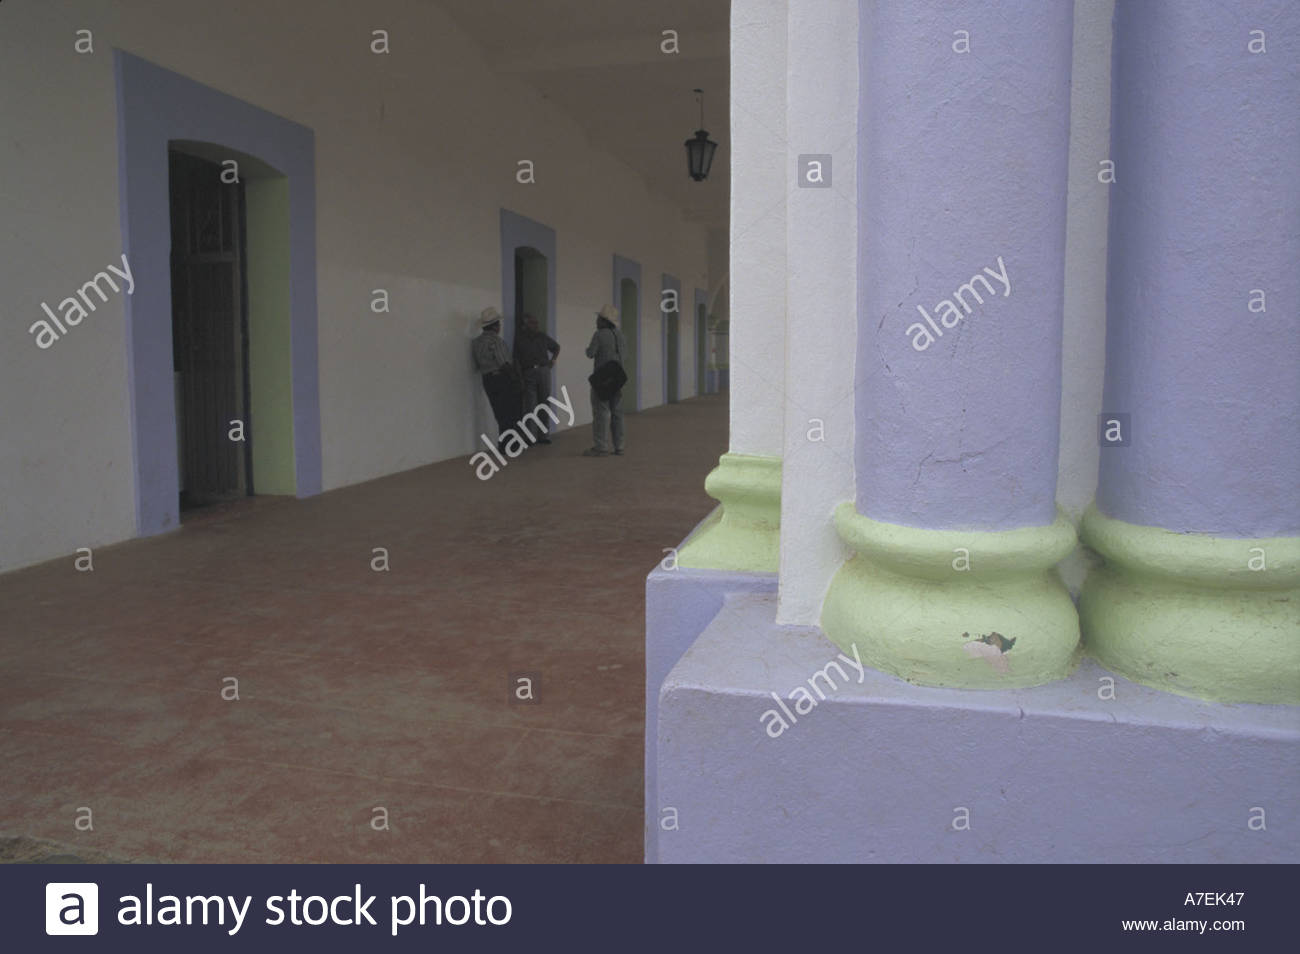 Como Decorar Una Columna Free Columnas De Ducha Sensacional Best - Como-decorar-columnas